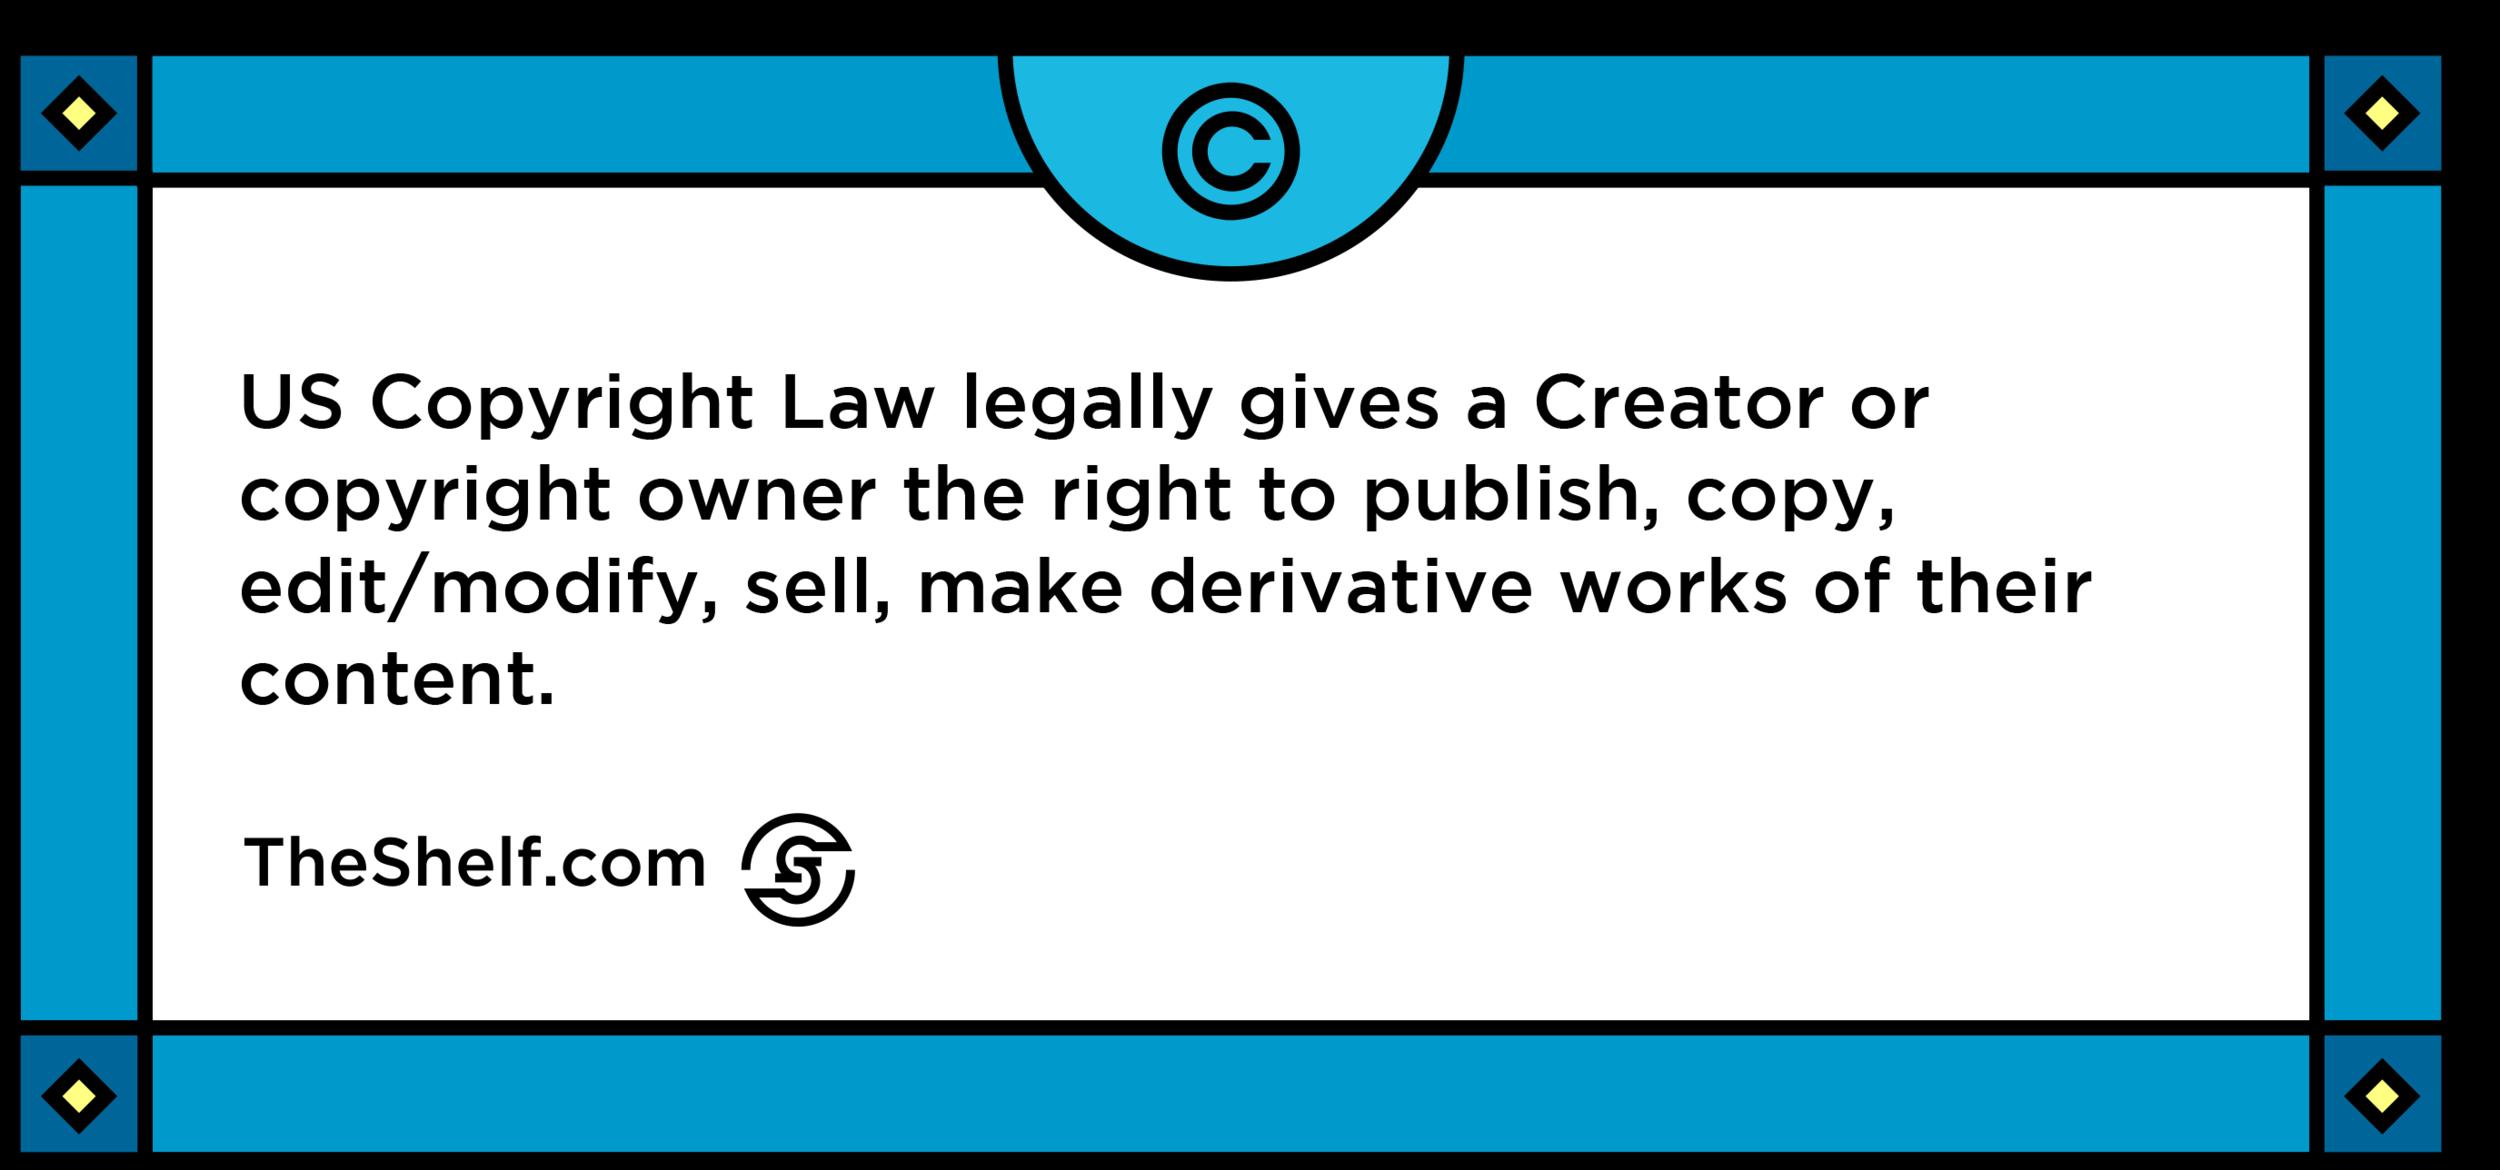 UGC Rights - UpWork_4.png